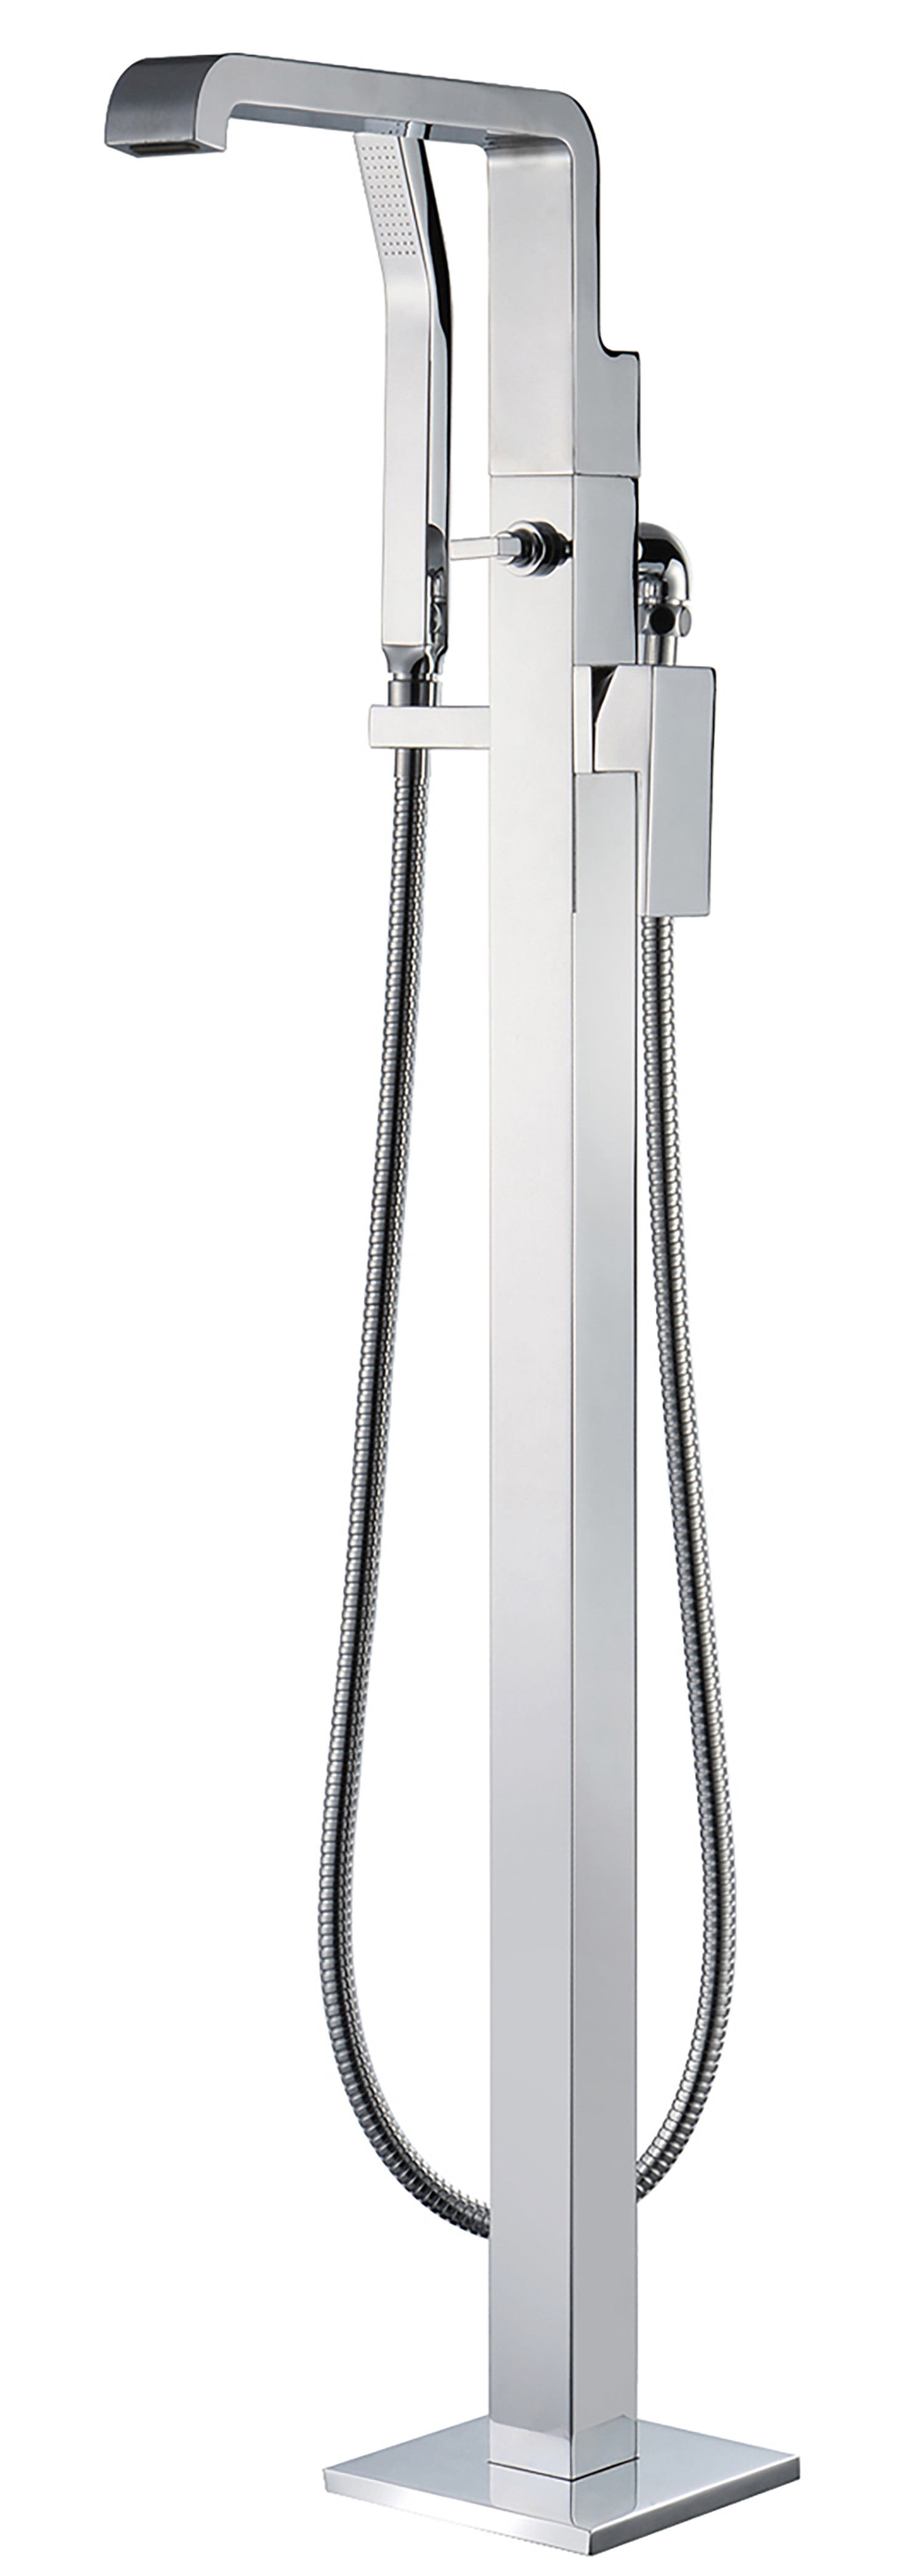 Estrada Freestanding Waterfall Bath Shower Mixer